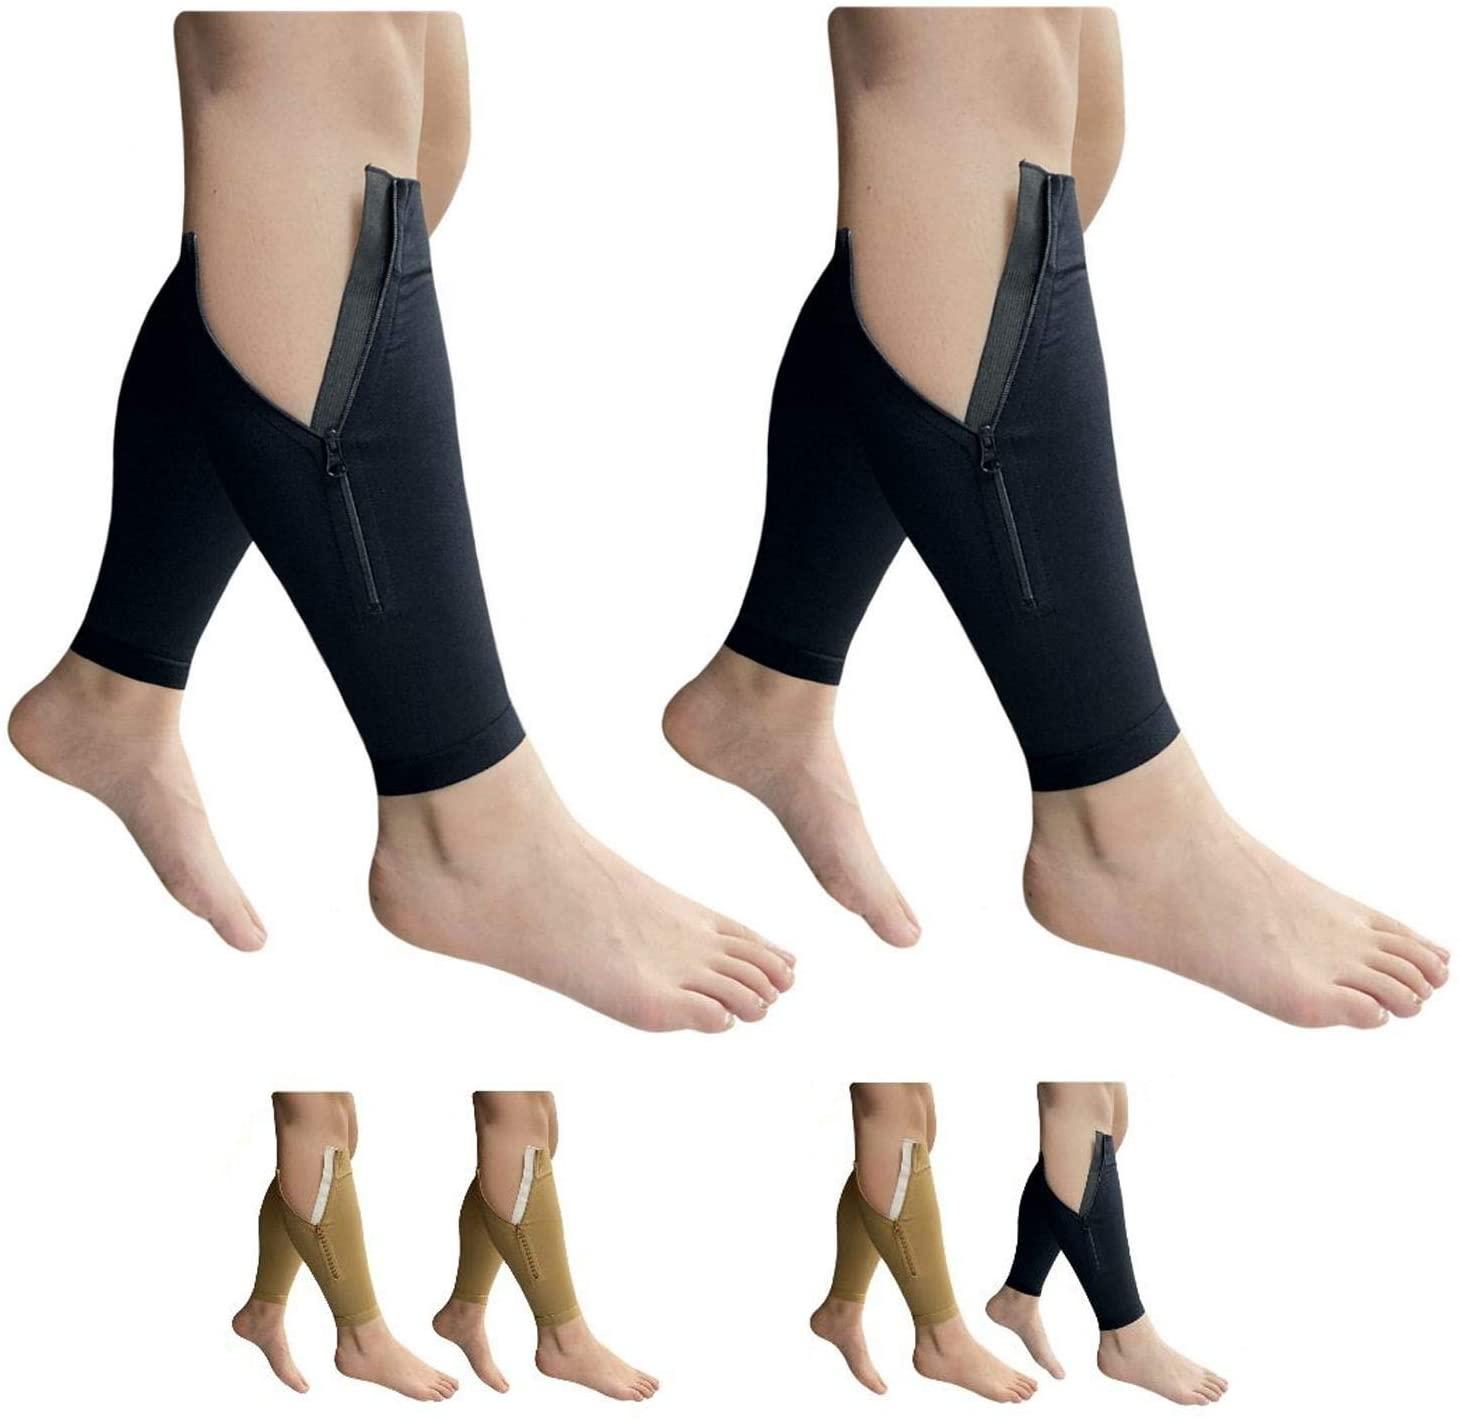 HealthyNees Shin Footless 20-30 mmHg Zipper Compression Leg Calf 2 Pairs Sleeve (Black Combo, 3X-Large)